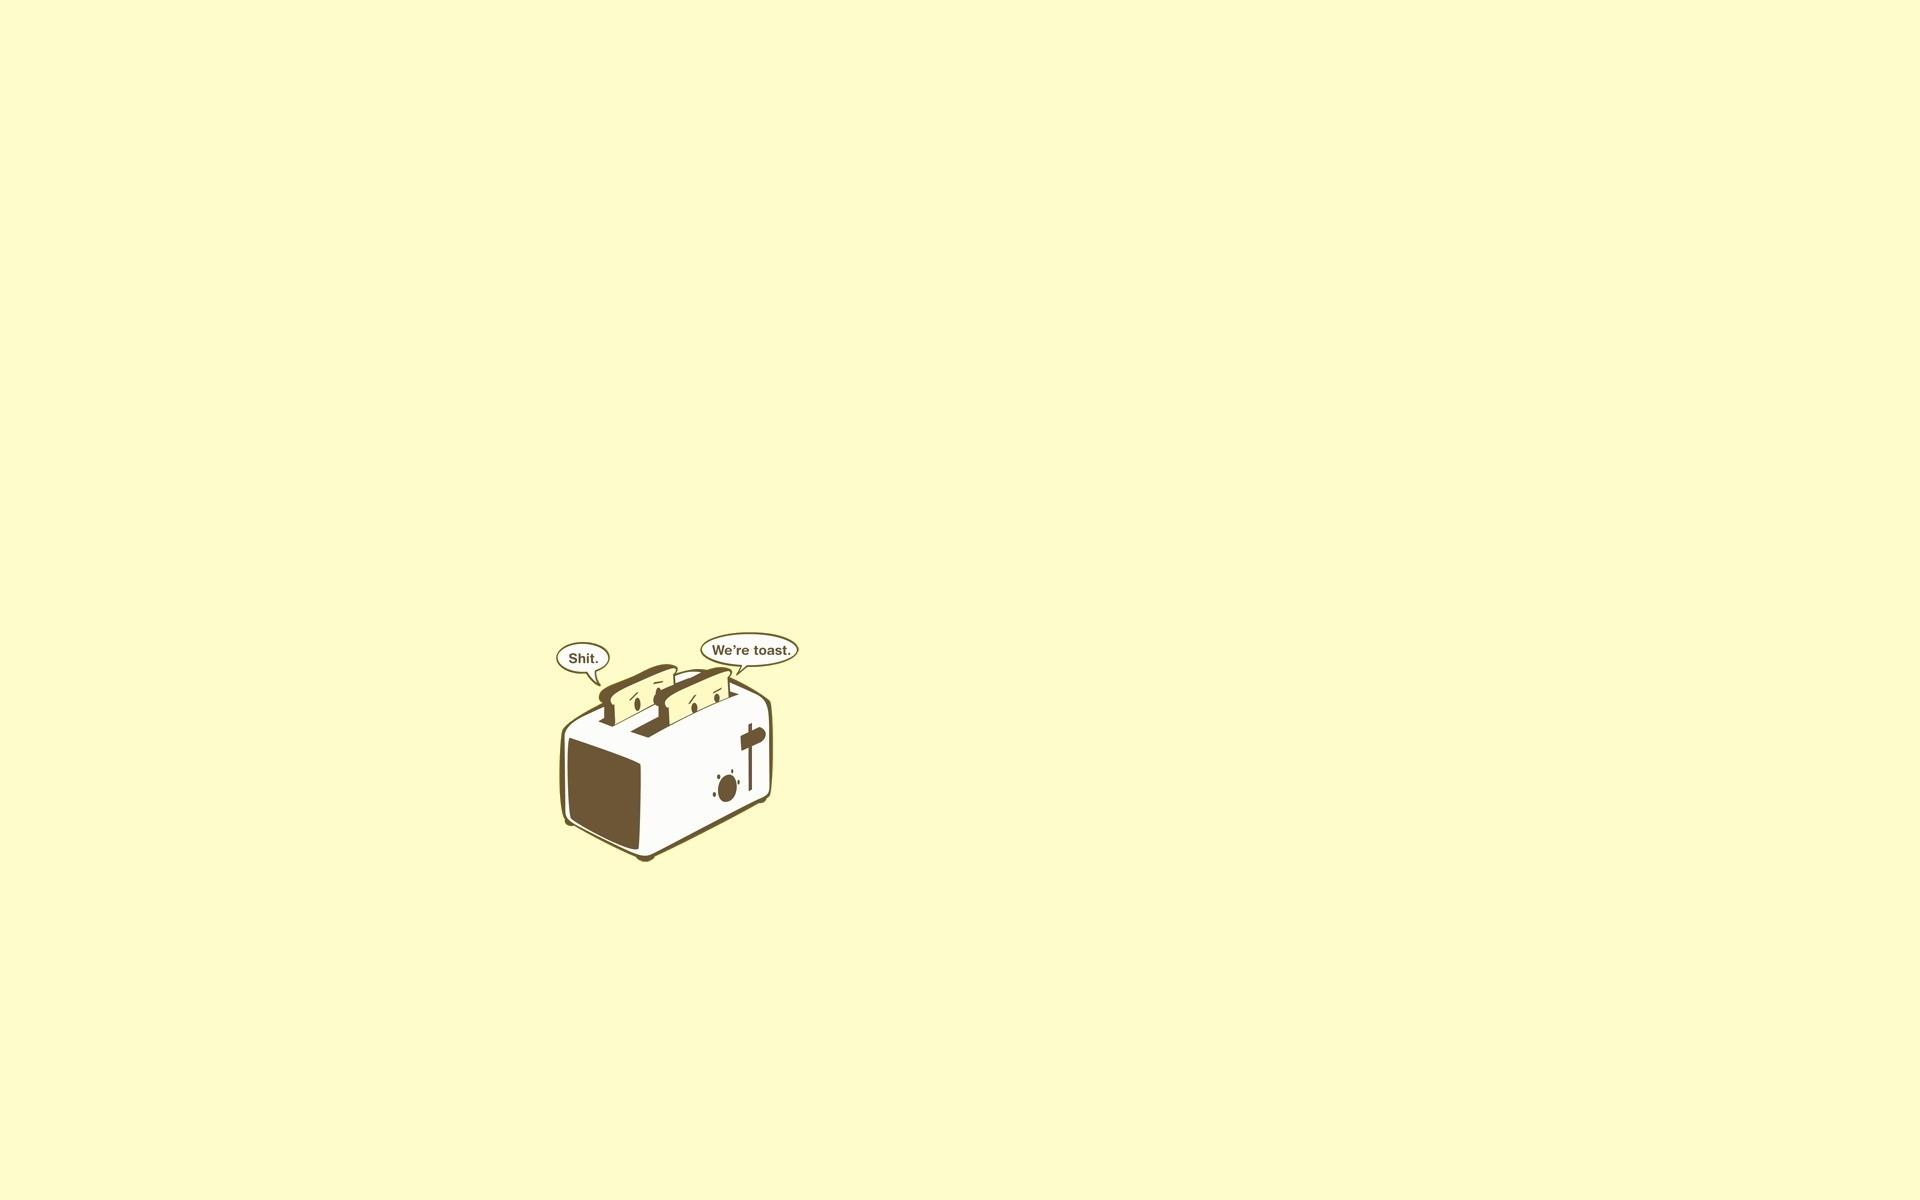 Minimalist Aesthetic Mac Wallpaper Tumblr Themediocremama Com